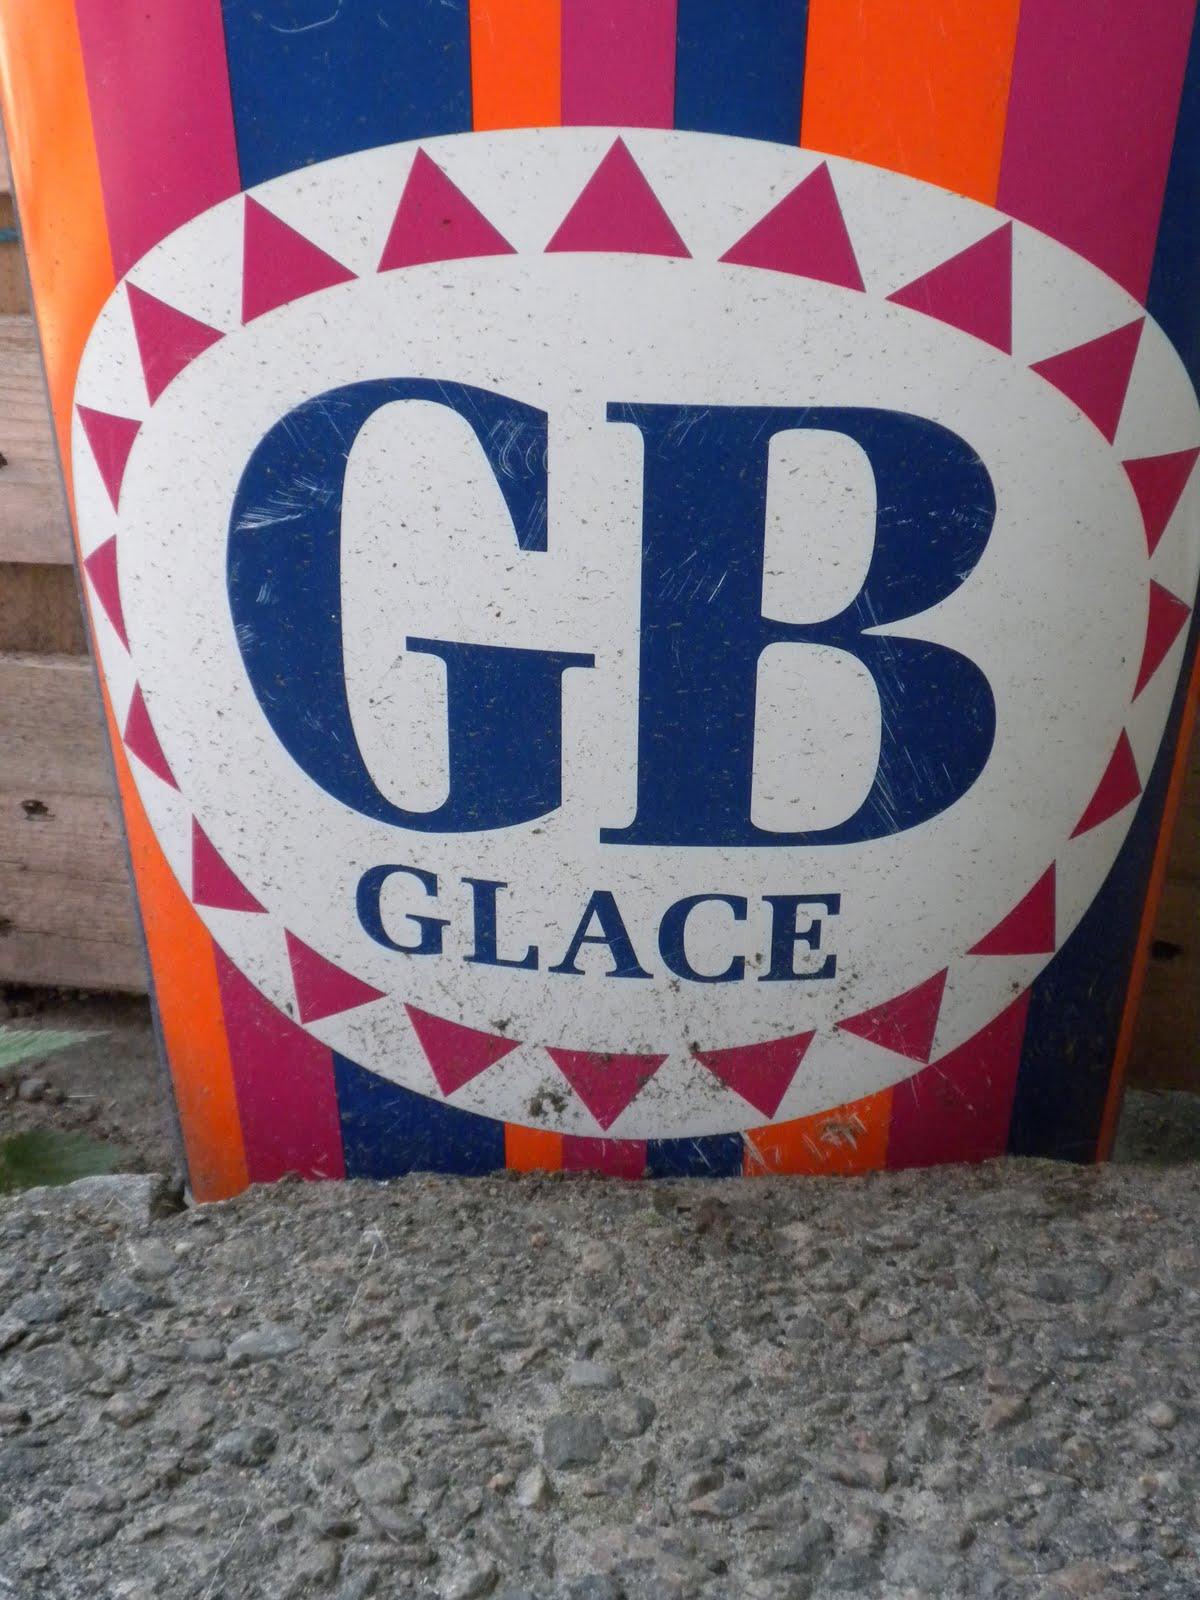 Eat Prints: GB Glace